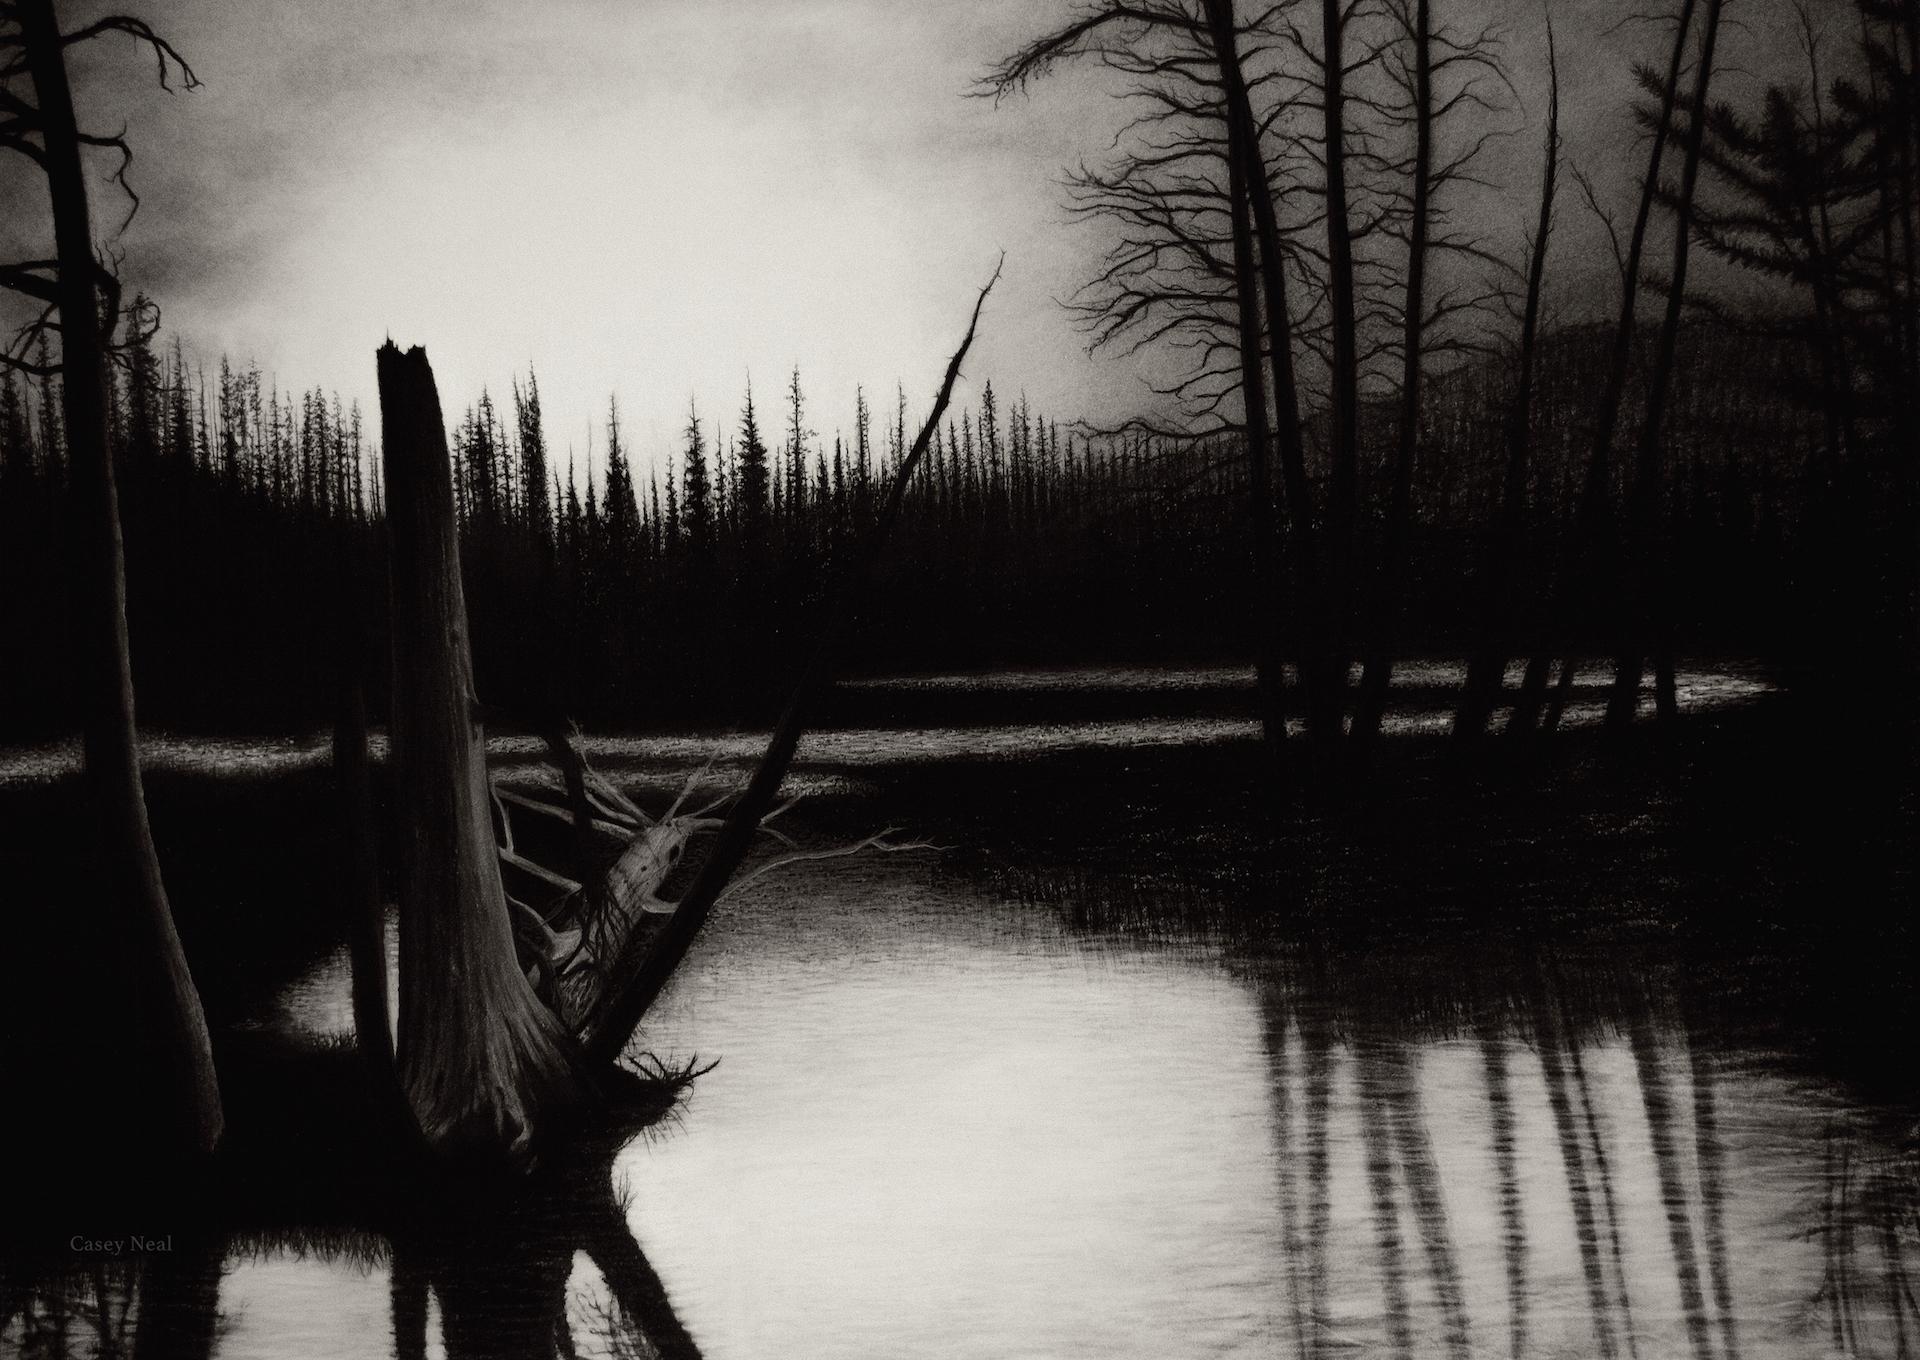 Drawn scenic senary Landscape Charcoal by CaseyNealArtwork by